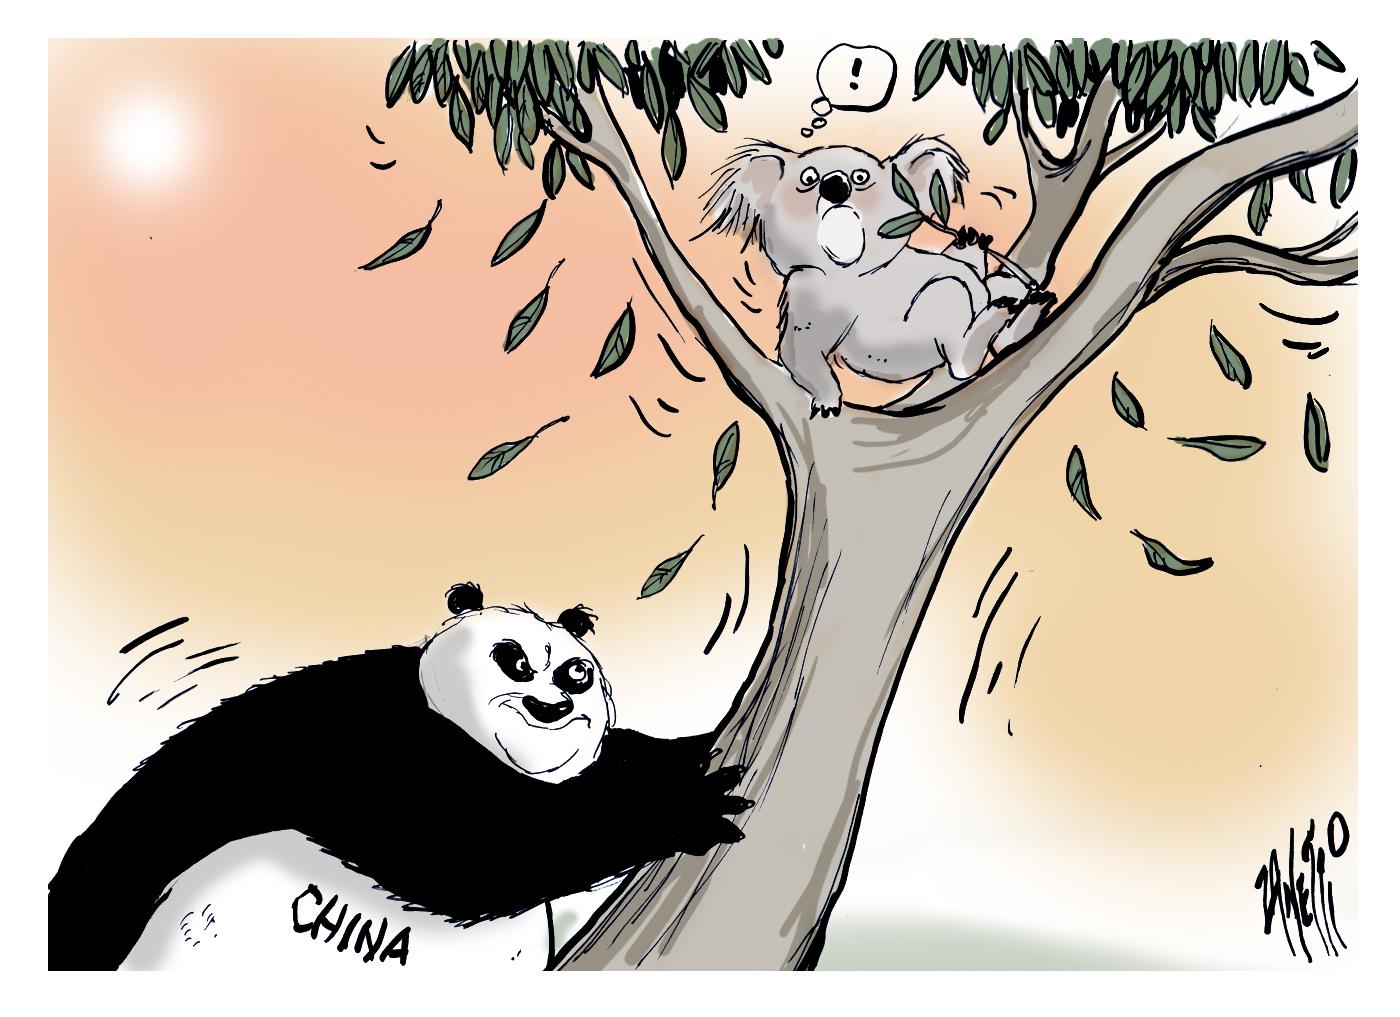 China influence in Australia